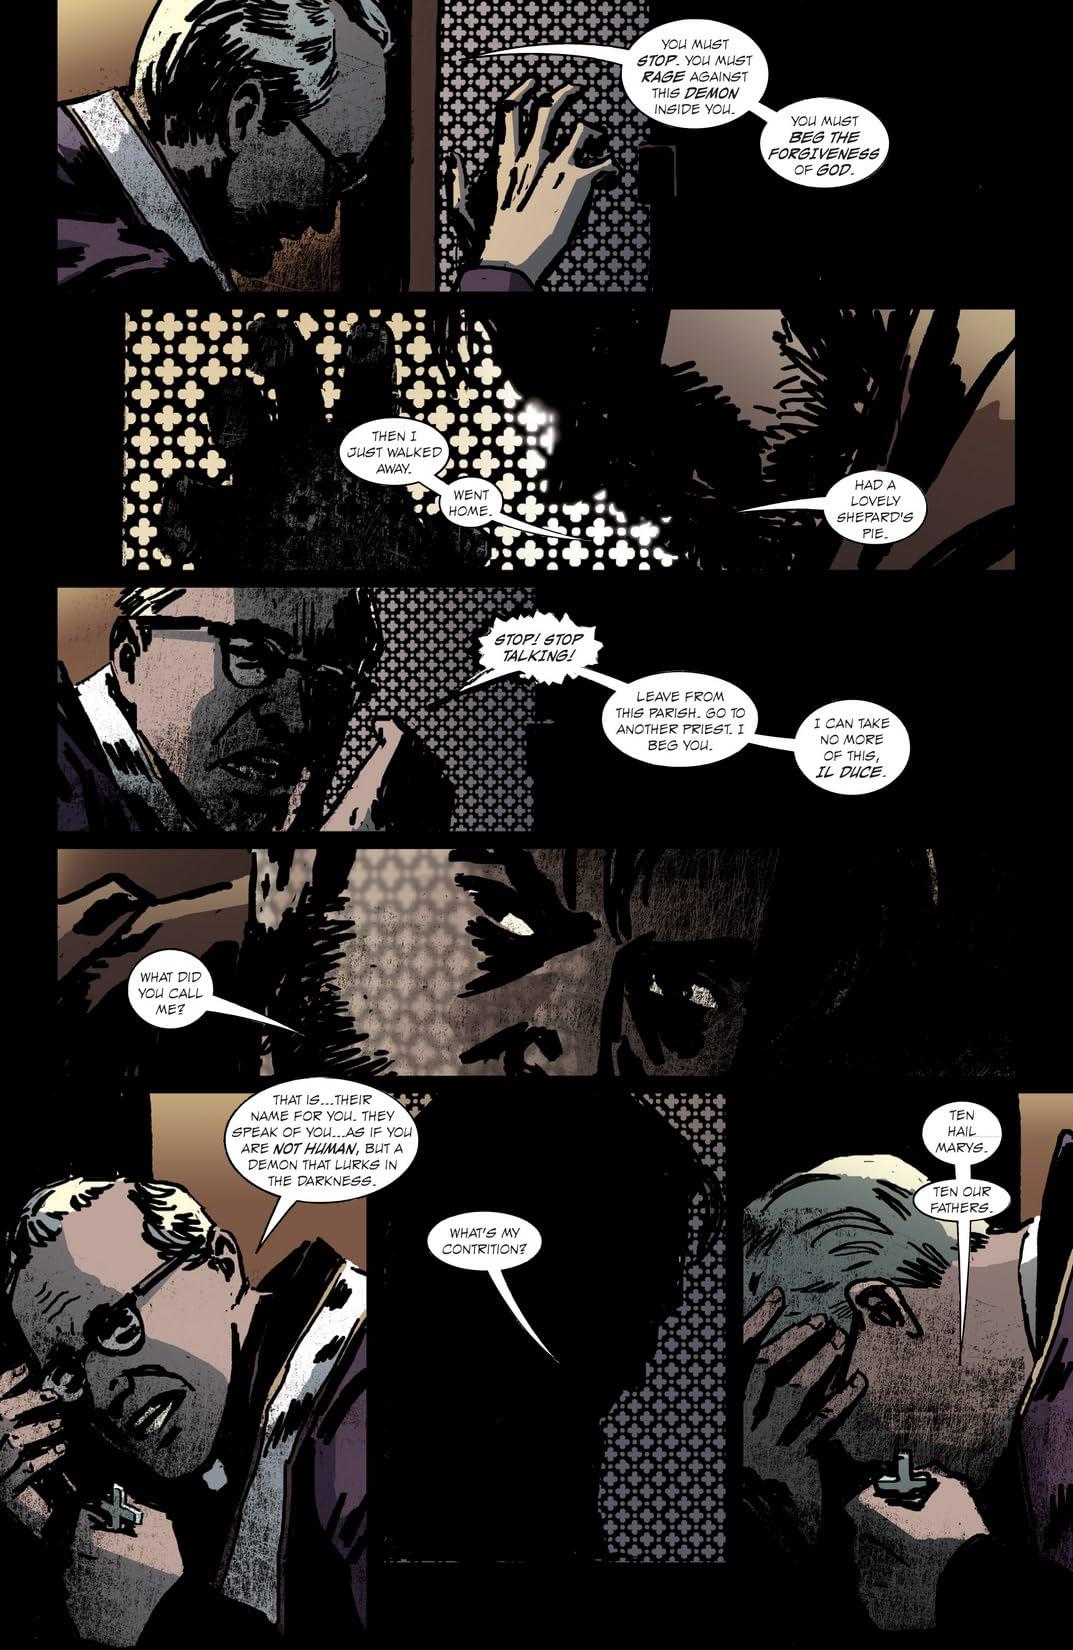 Boondock Saints: In Nomine Patris #6 (of 6)